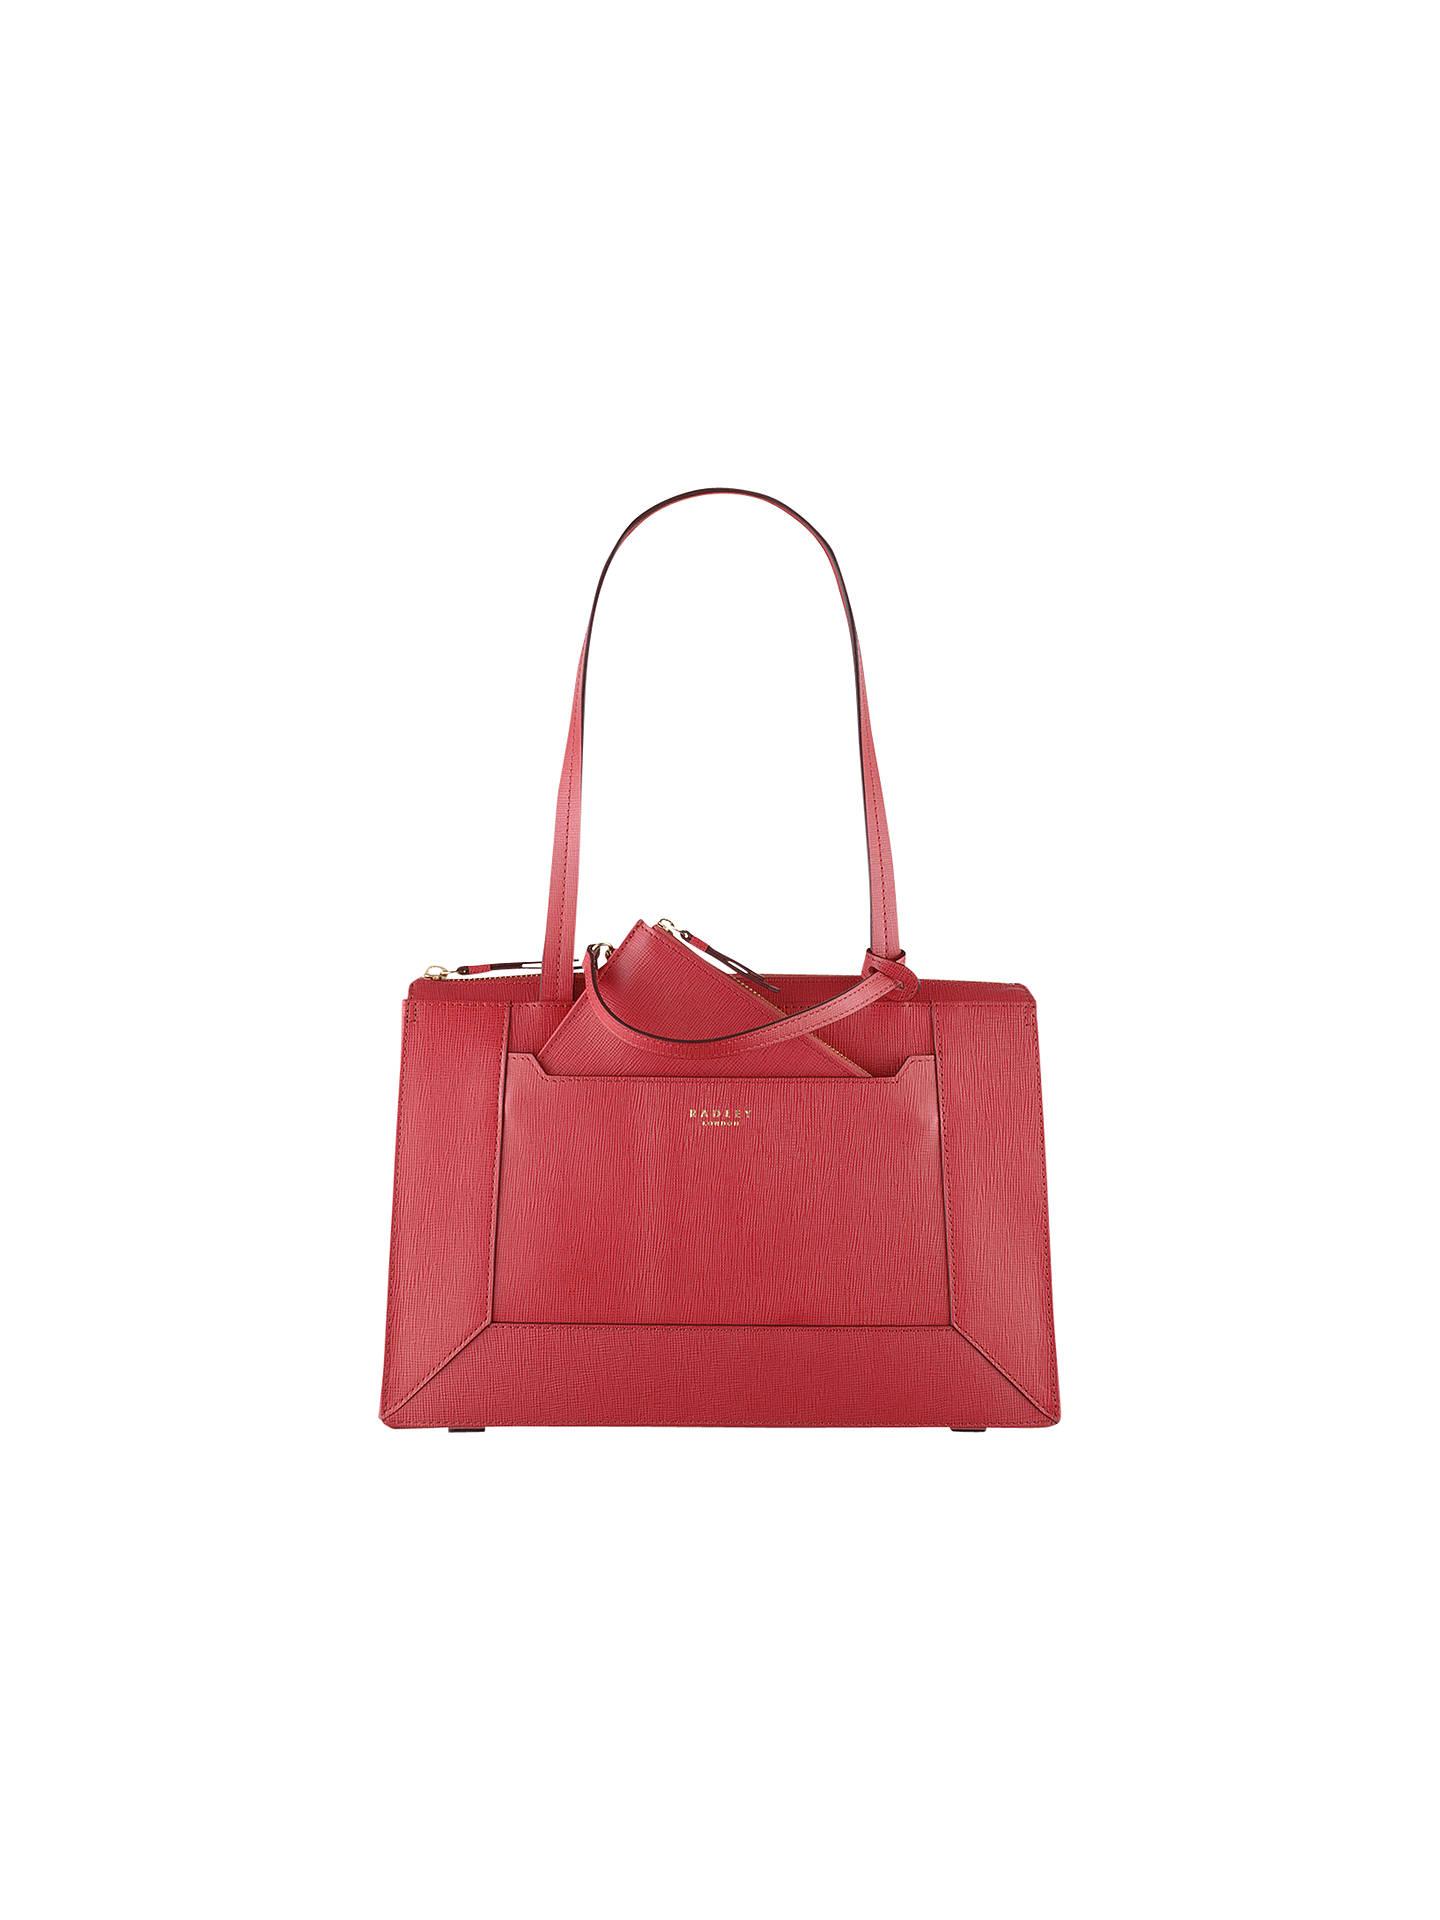 79fd8ec4cb Buy Radley Hardwick Leather Medium Tote Bag